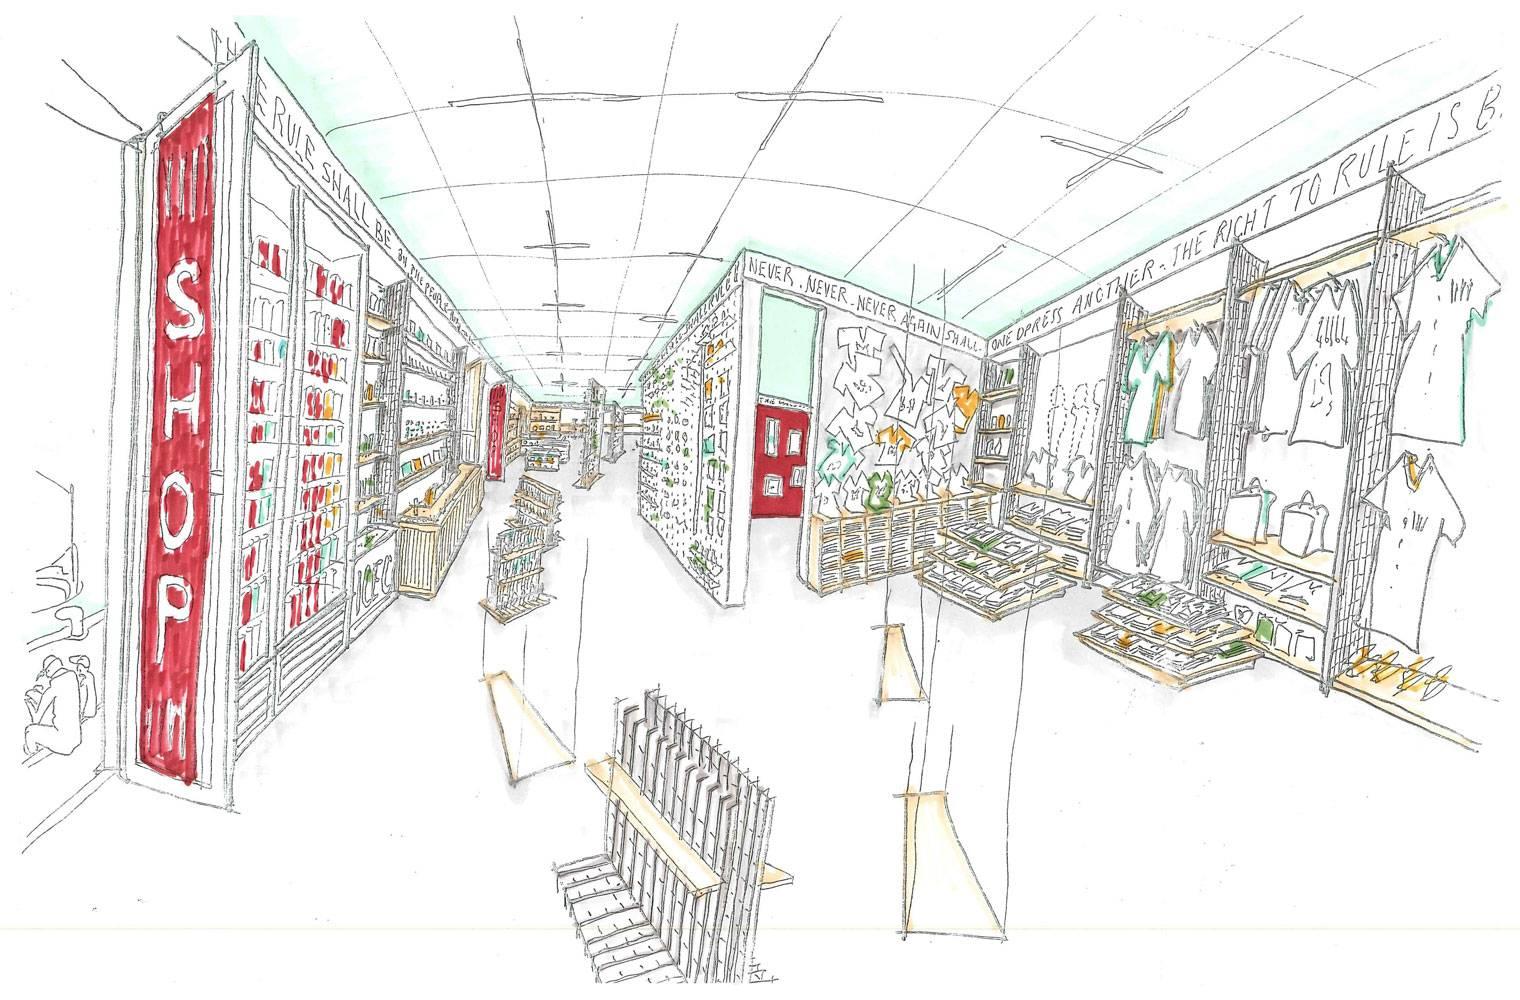 Robben Island - Retail Store Concept Sketches